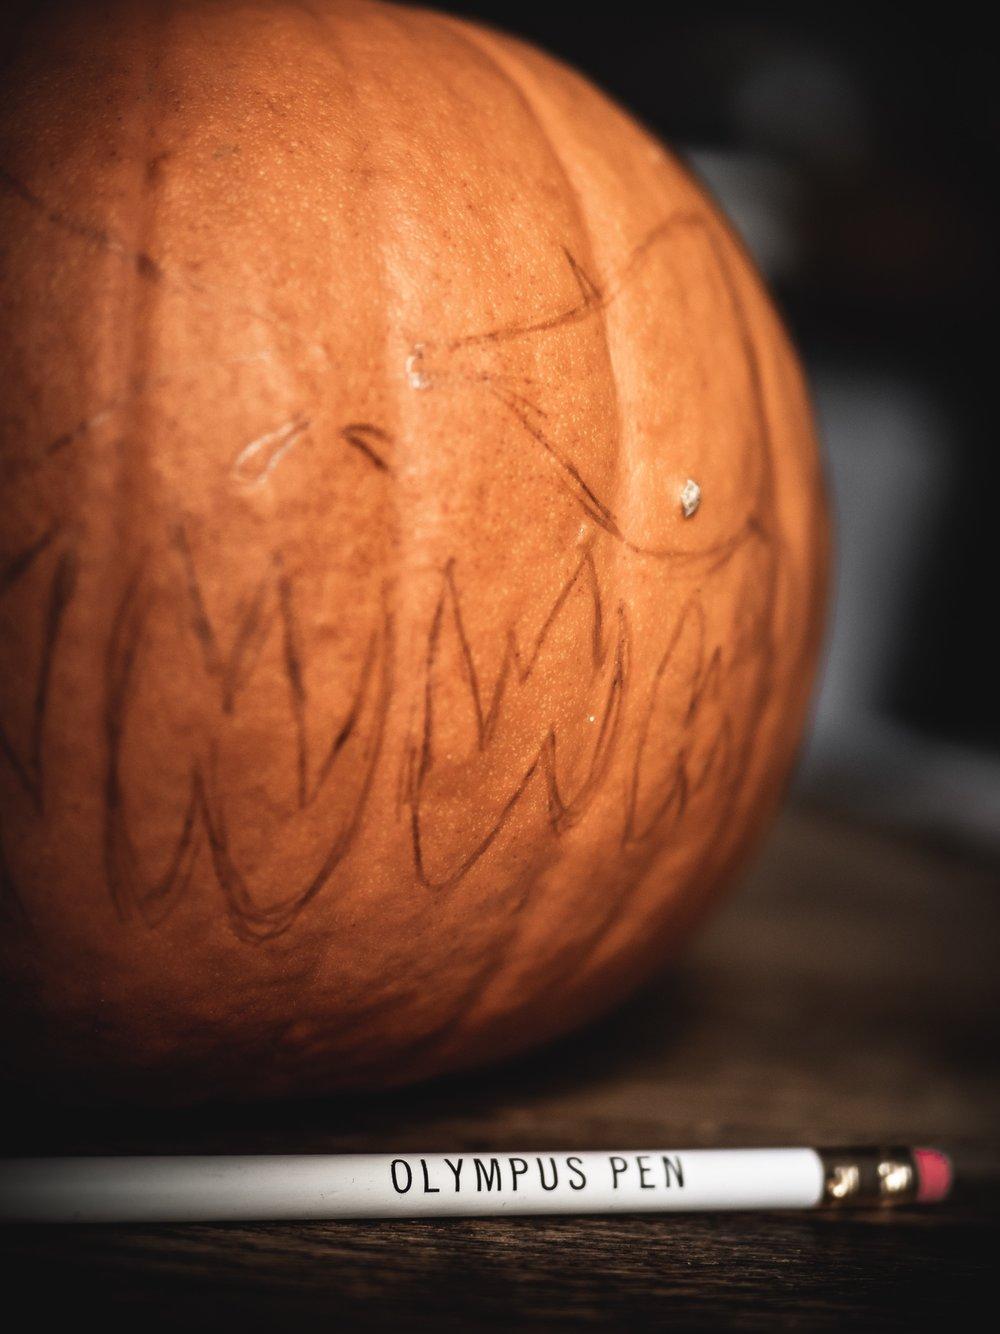 Halloween Pumpkin Carving Jack-o-Lantern Art Craft Creativity Scary Olympus PEN Pencil